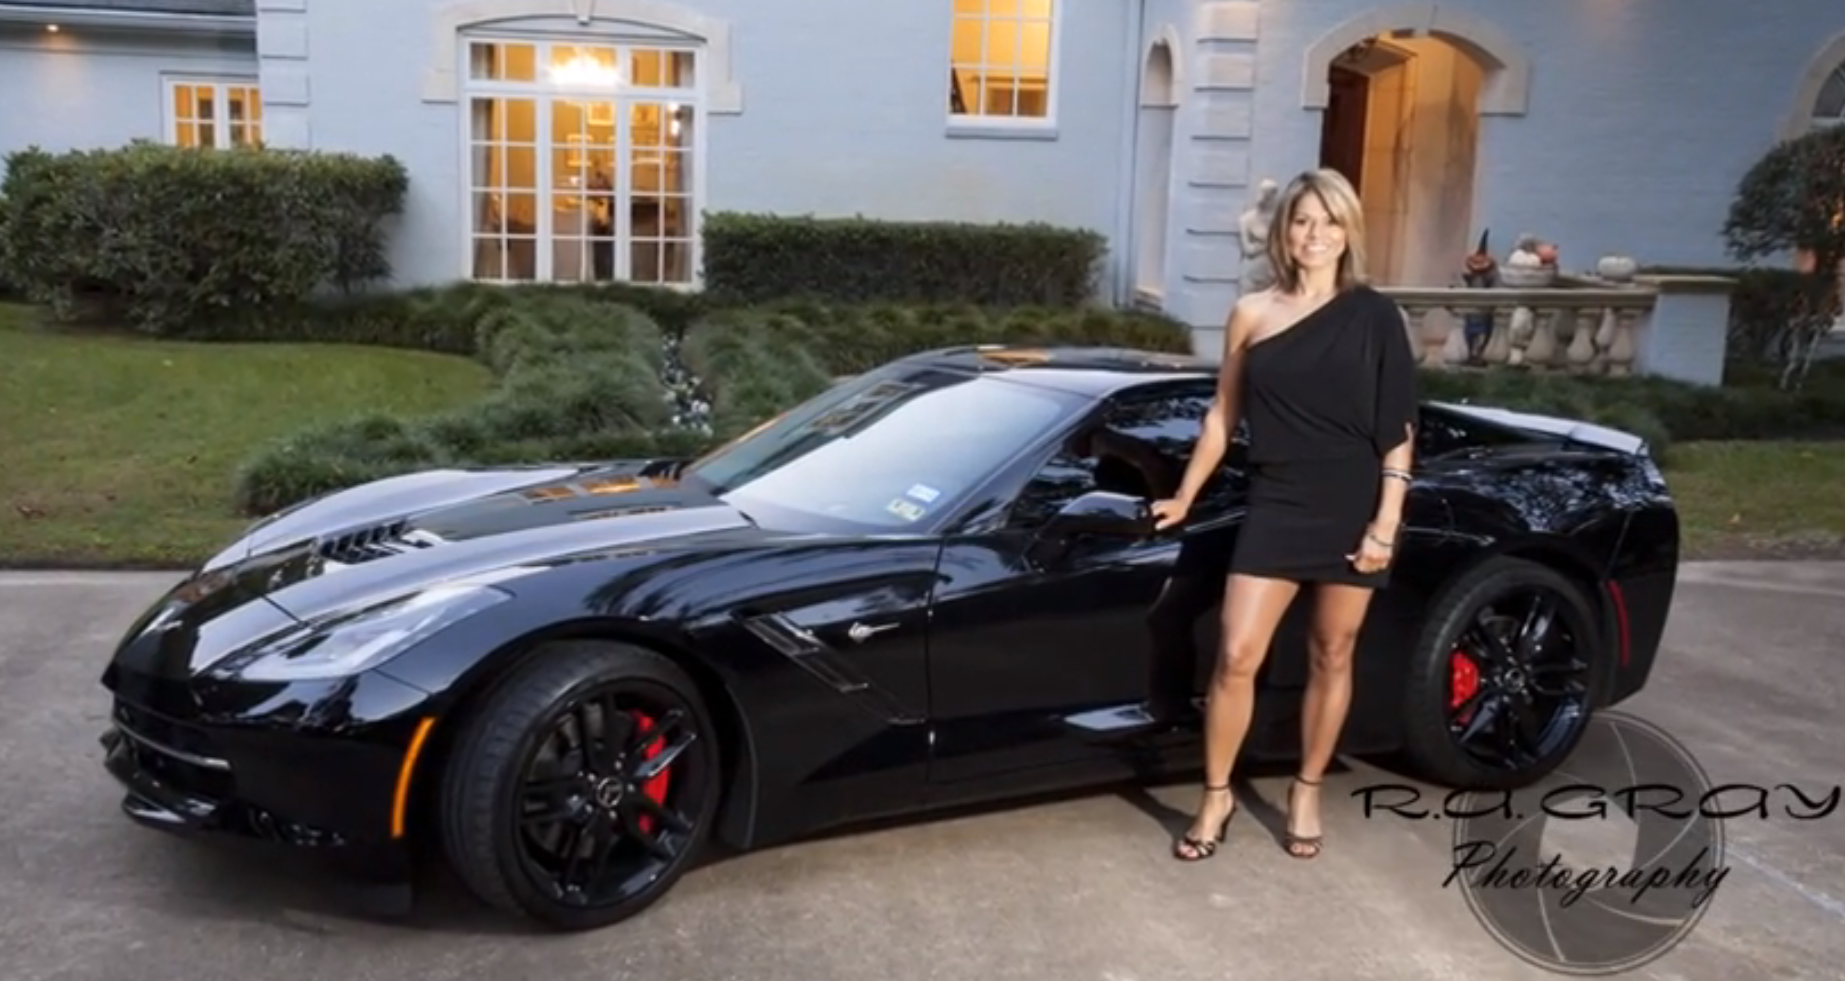 best lking toys on the web post em up page 4 - 2015 Corvette Stingray Matte Black